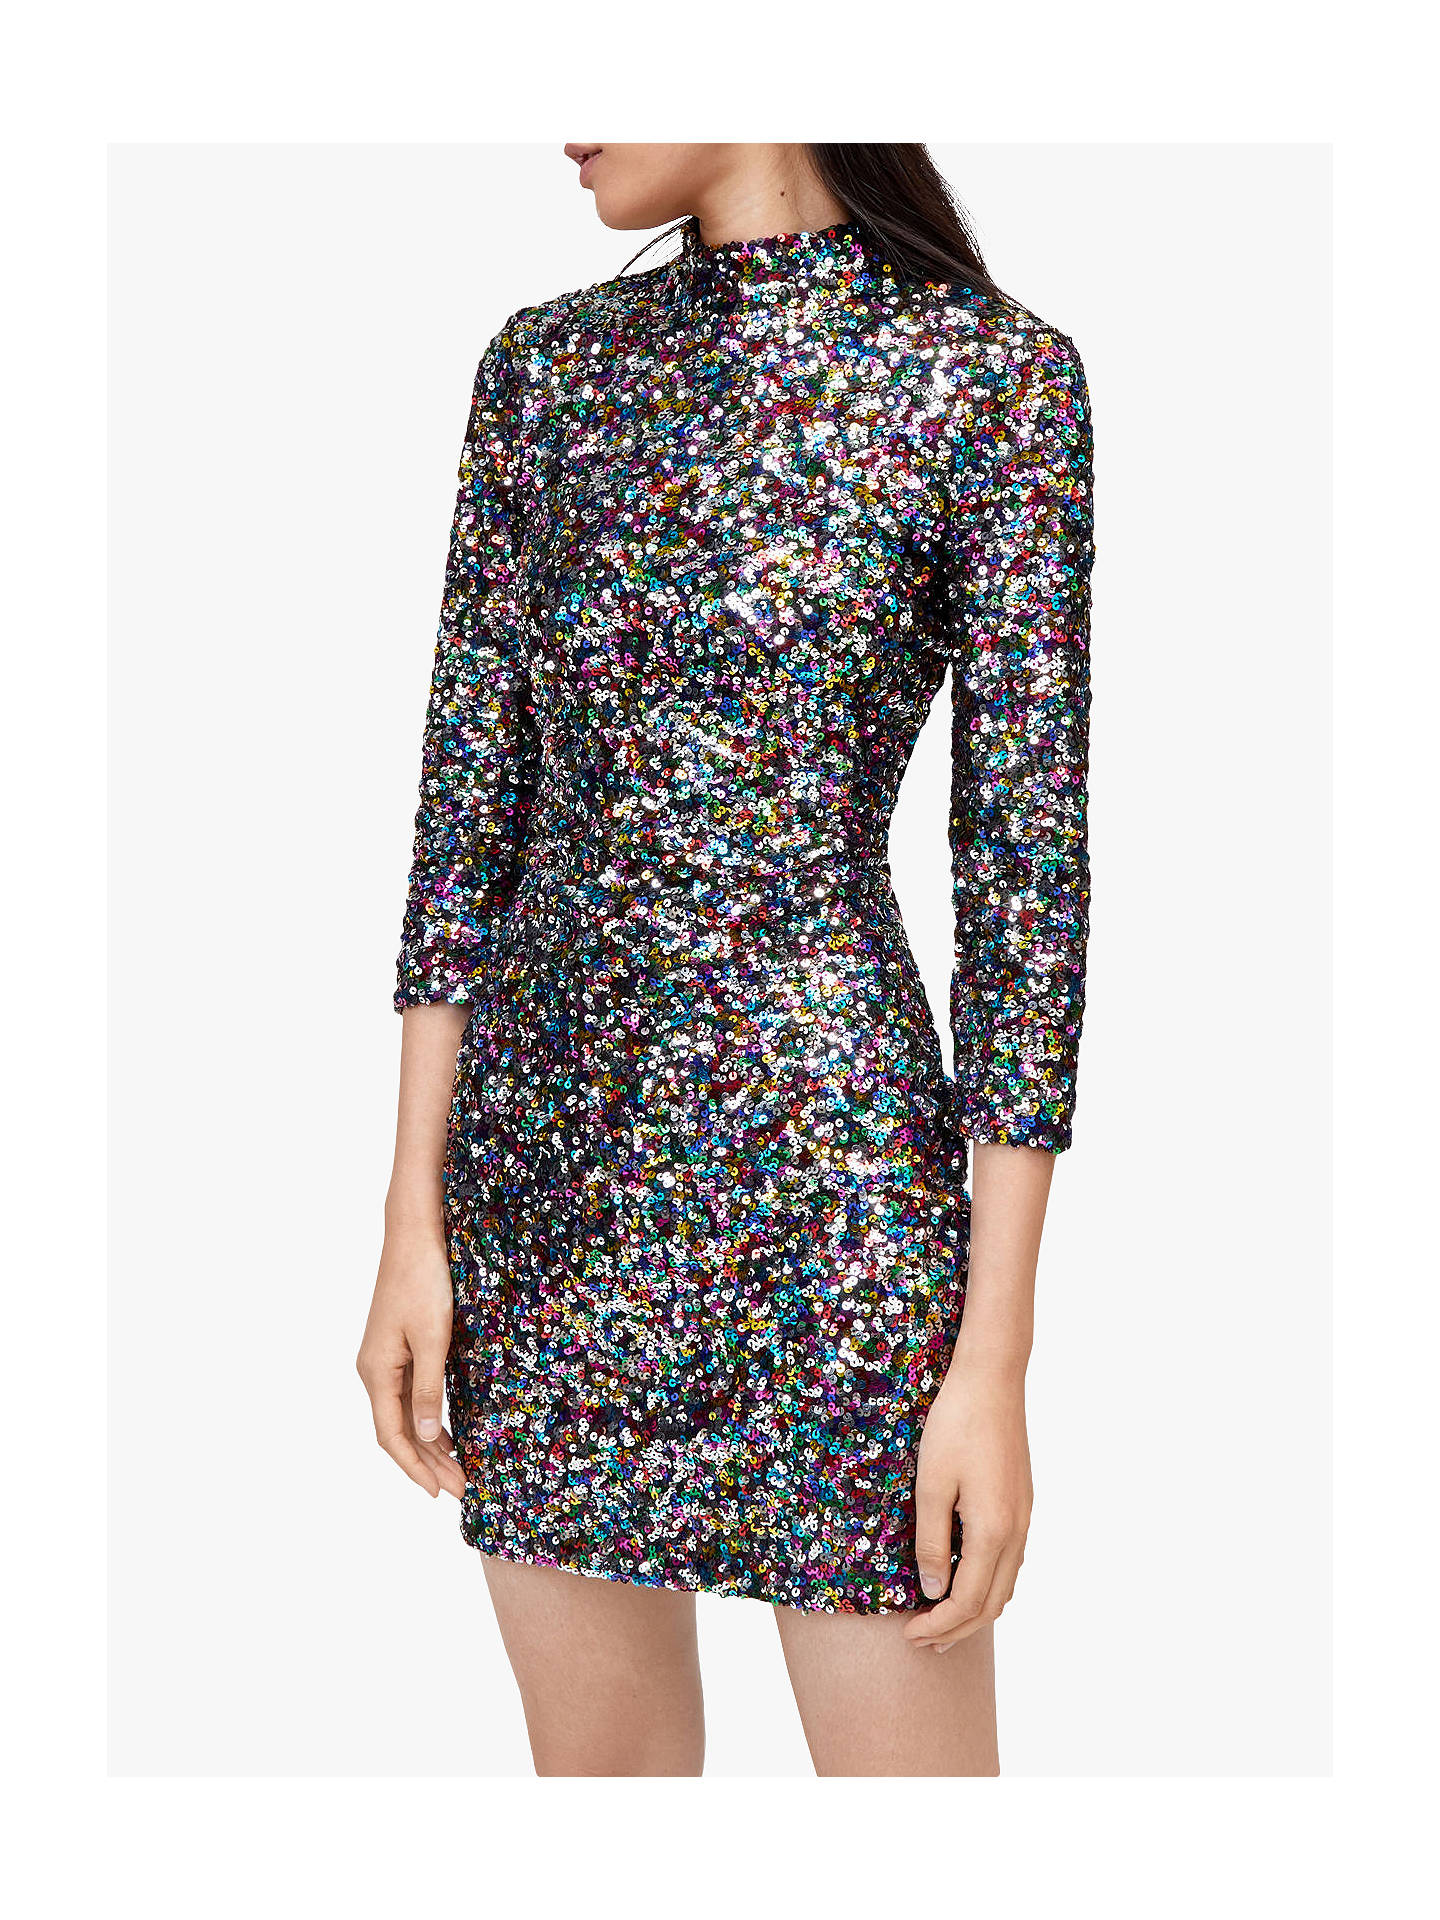 d850817acf8b Buy Warehouse Rainbow Sequin High Neck Dress, Multi, 18 Online at  johnlewis.com ...